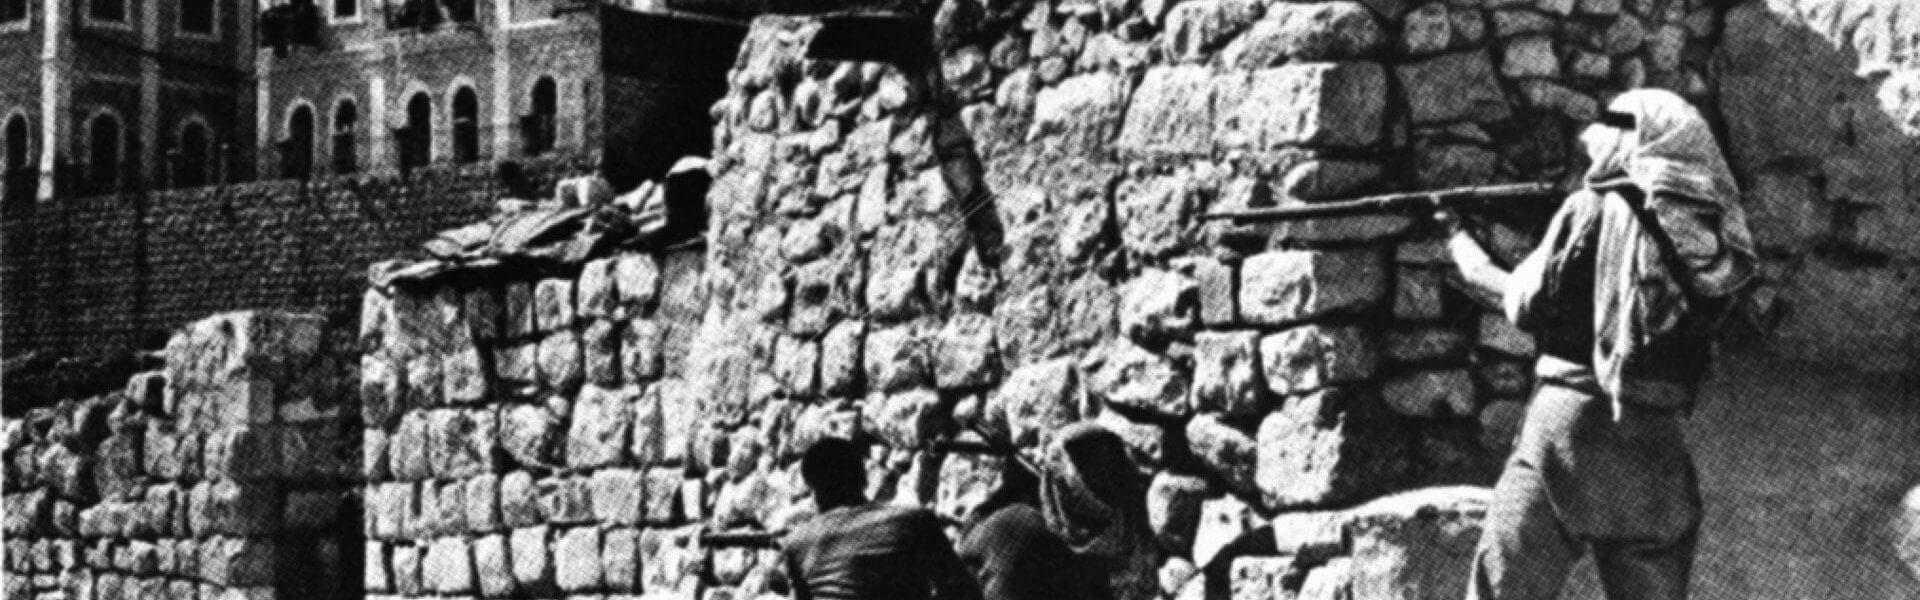 The Arab Legion attacking the Jewish Quarter of Jerusalem, May 1948. קרדיט תמונה: ויקישיתוף [public domain]